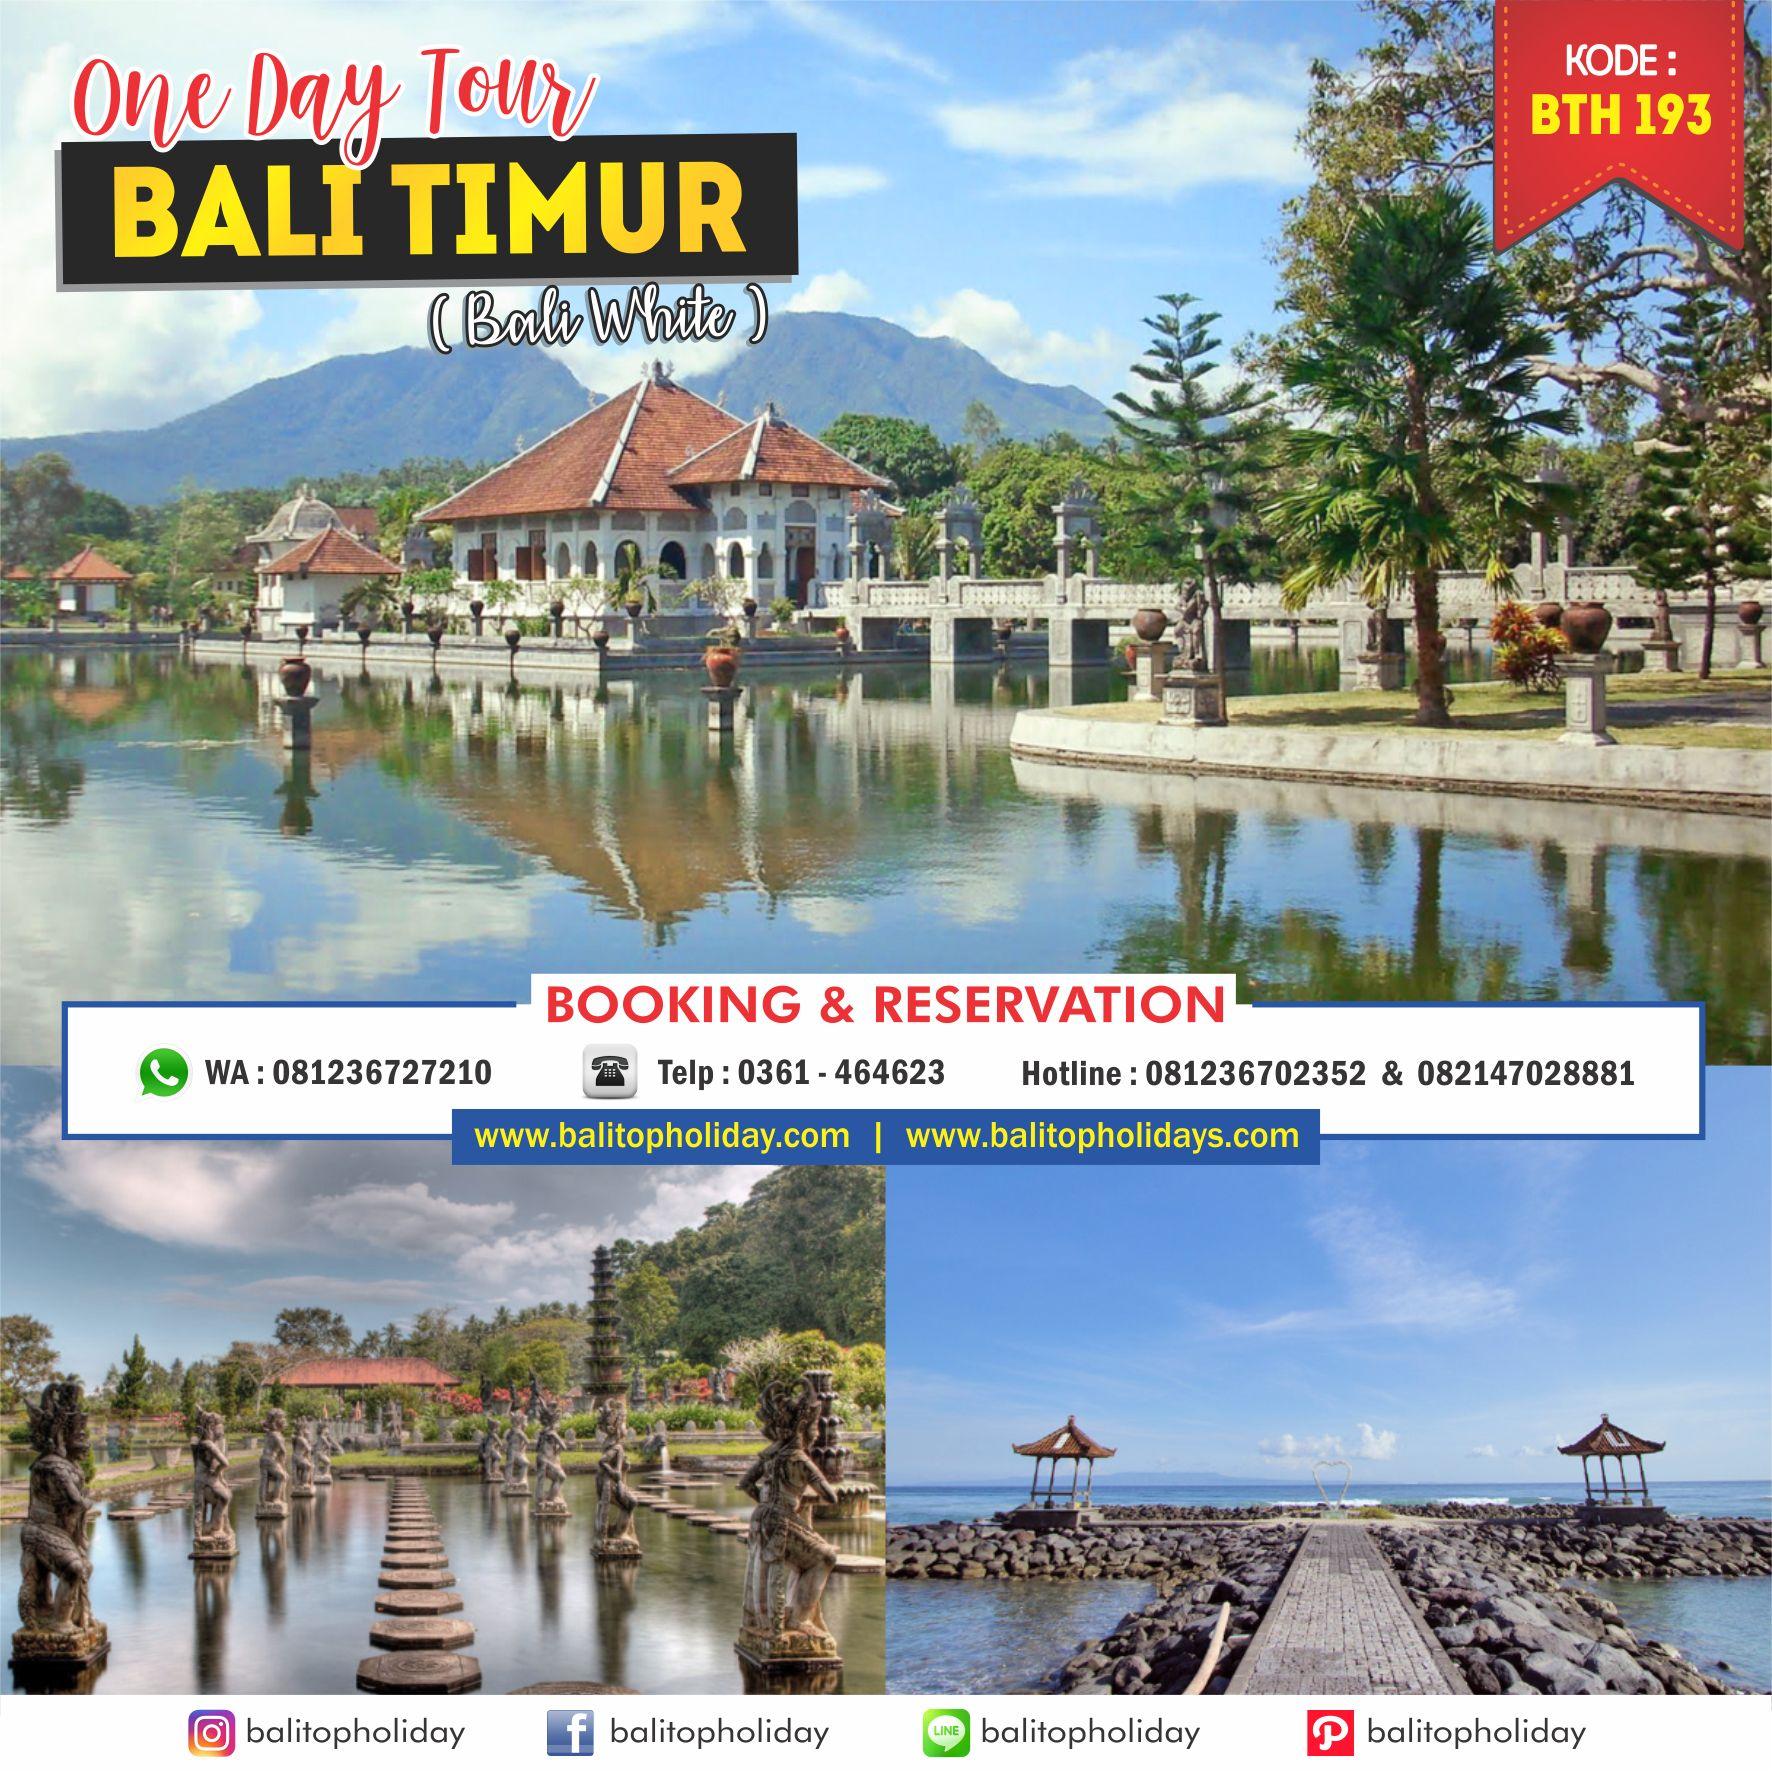 Paket One Day Tour Bali Timur